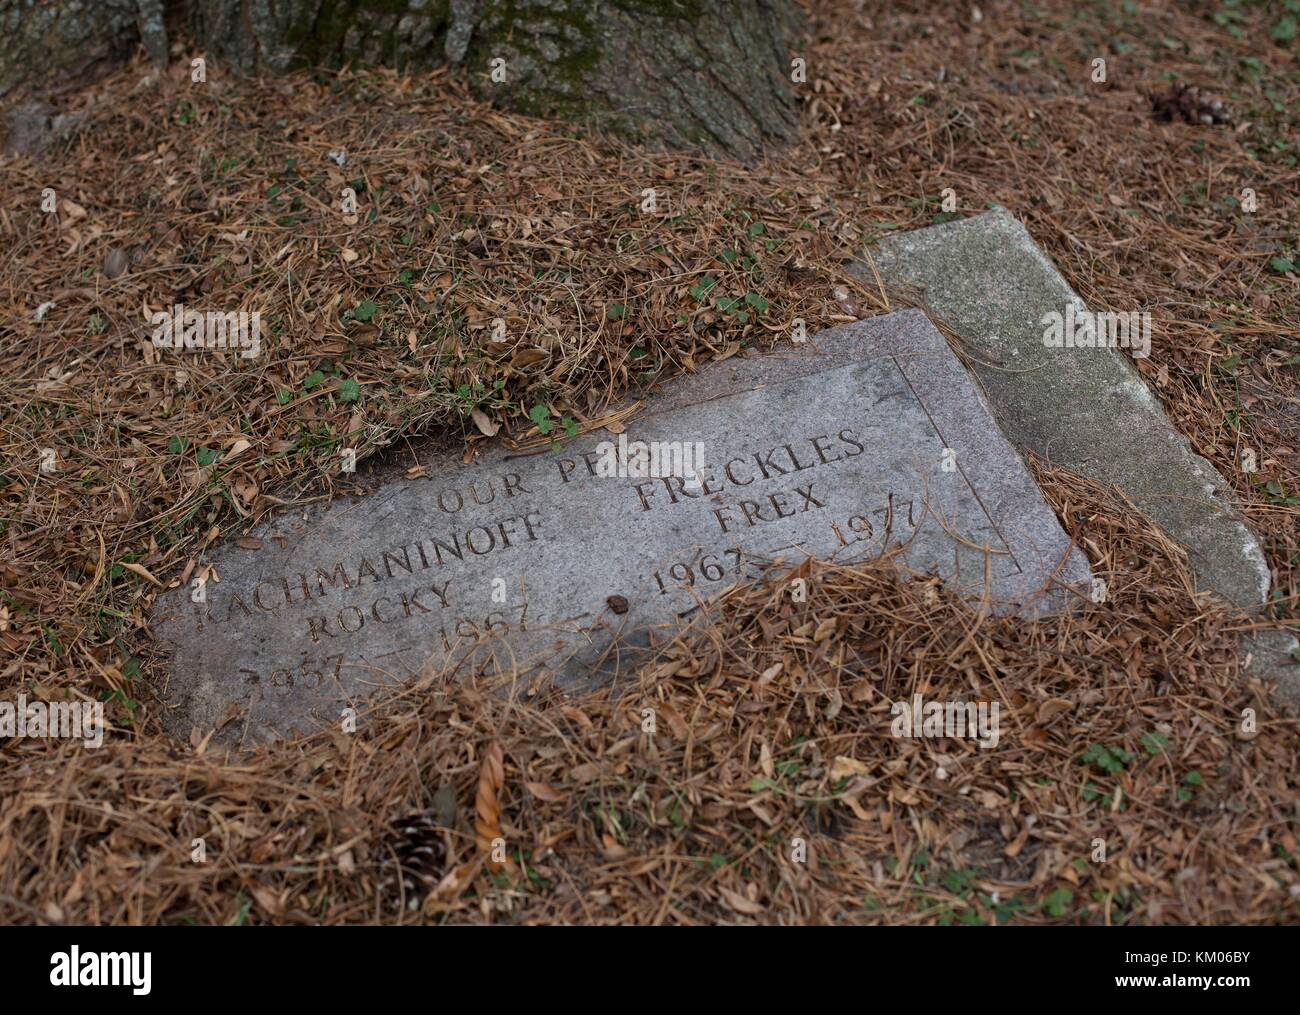 Pet Cemetery Stock Photos & Pet Cemetery Stock Images - Alamy